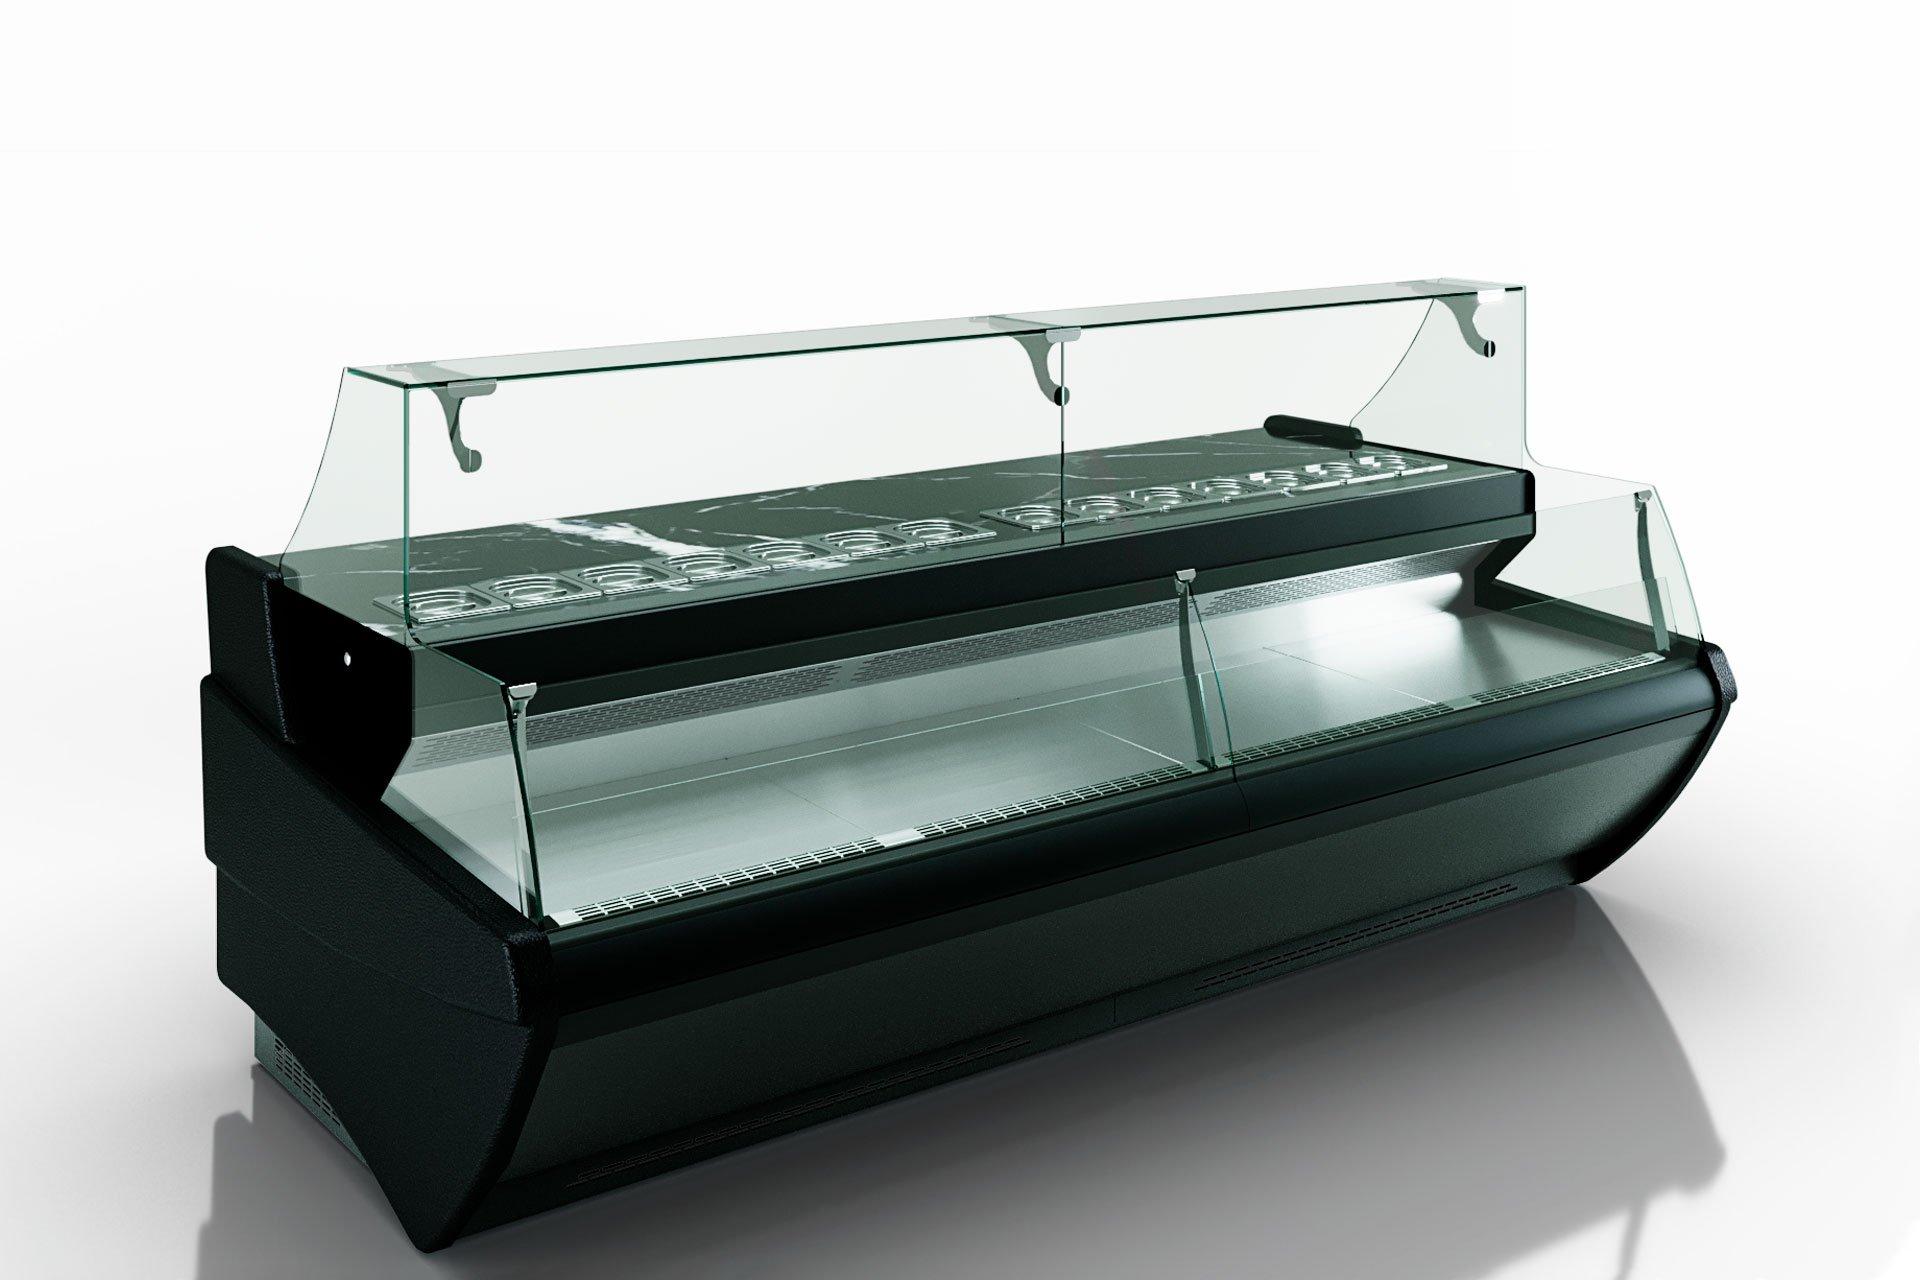 Вітрини Symphony MG 120 sushi/pizza combi L self 125-DBM/DBA